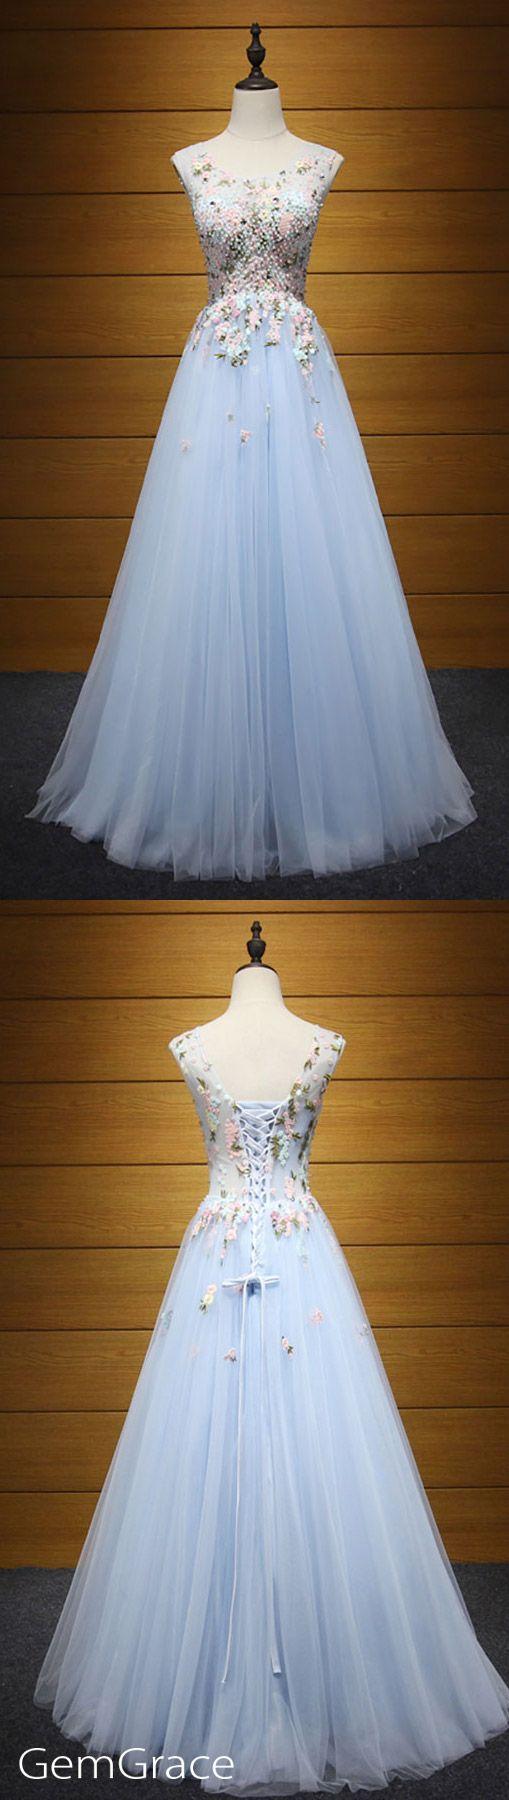 50 best Kleider images on Pinterest | Prom dresses, Long prom ...